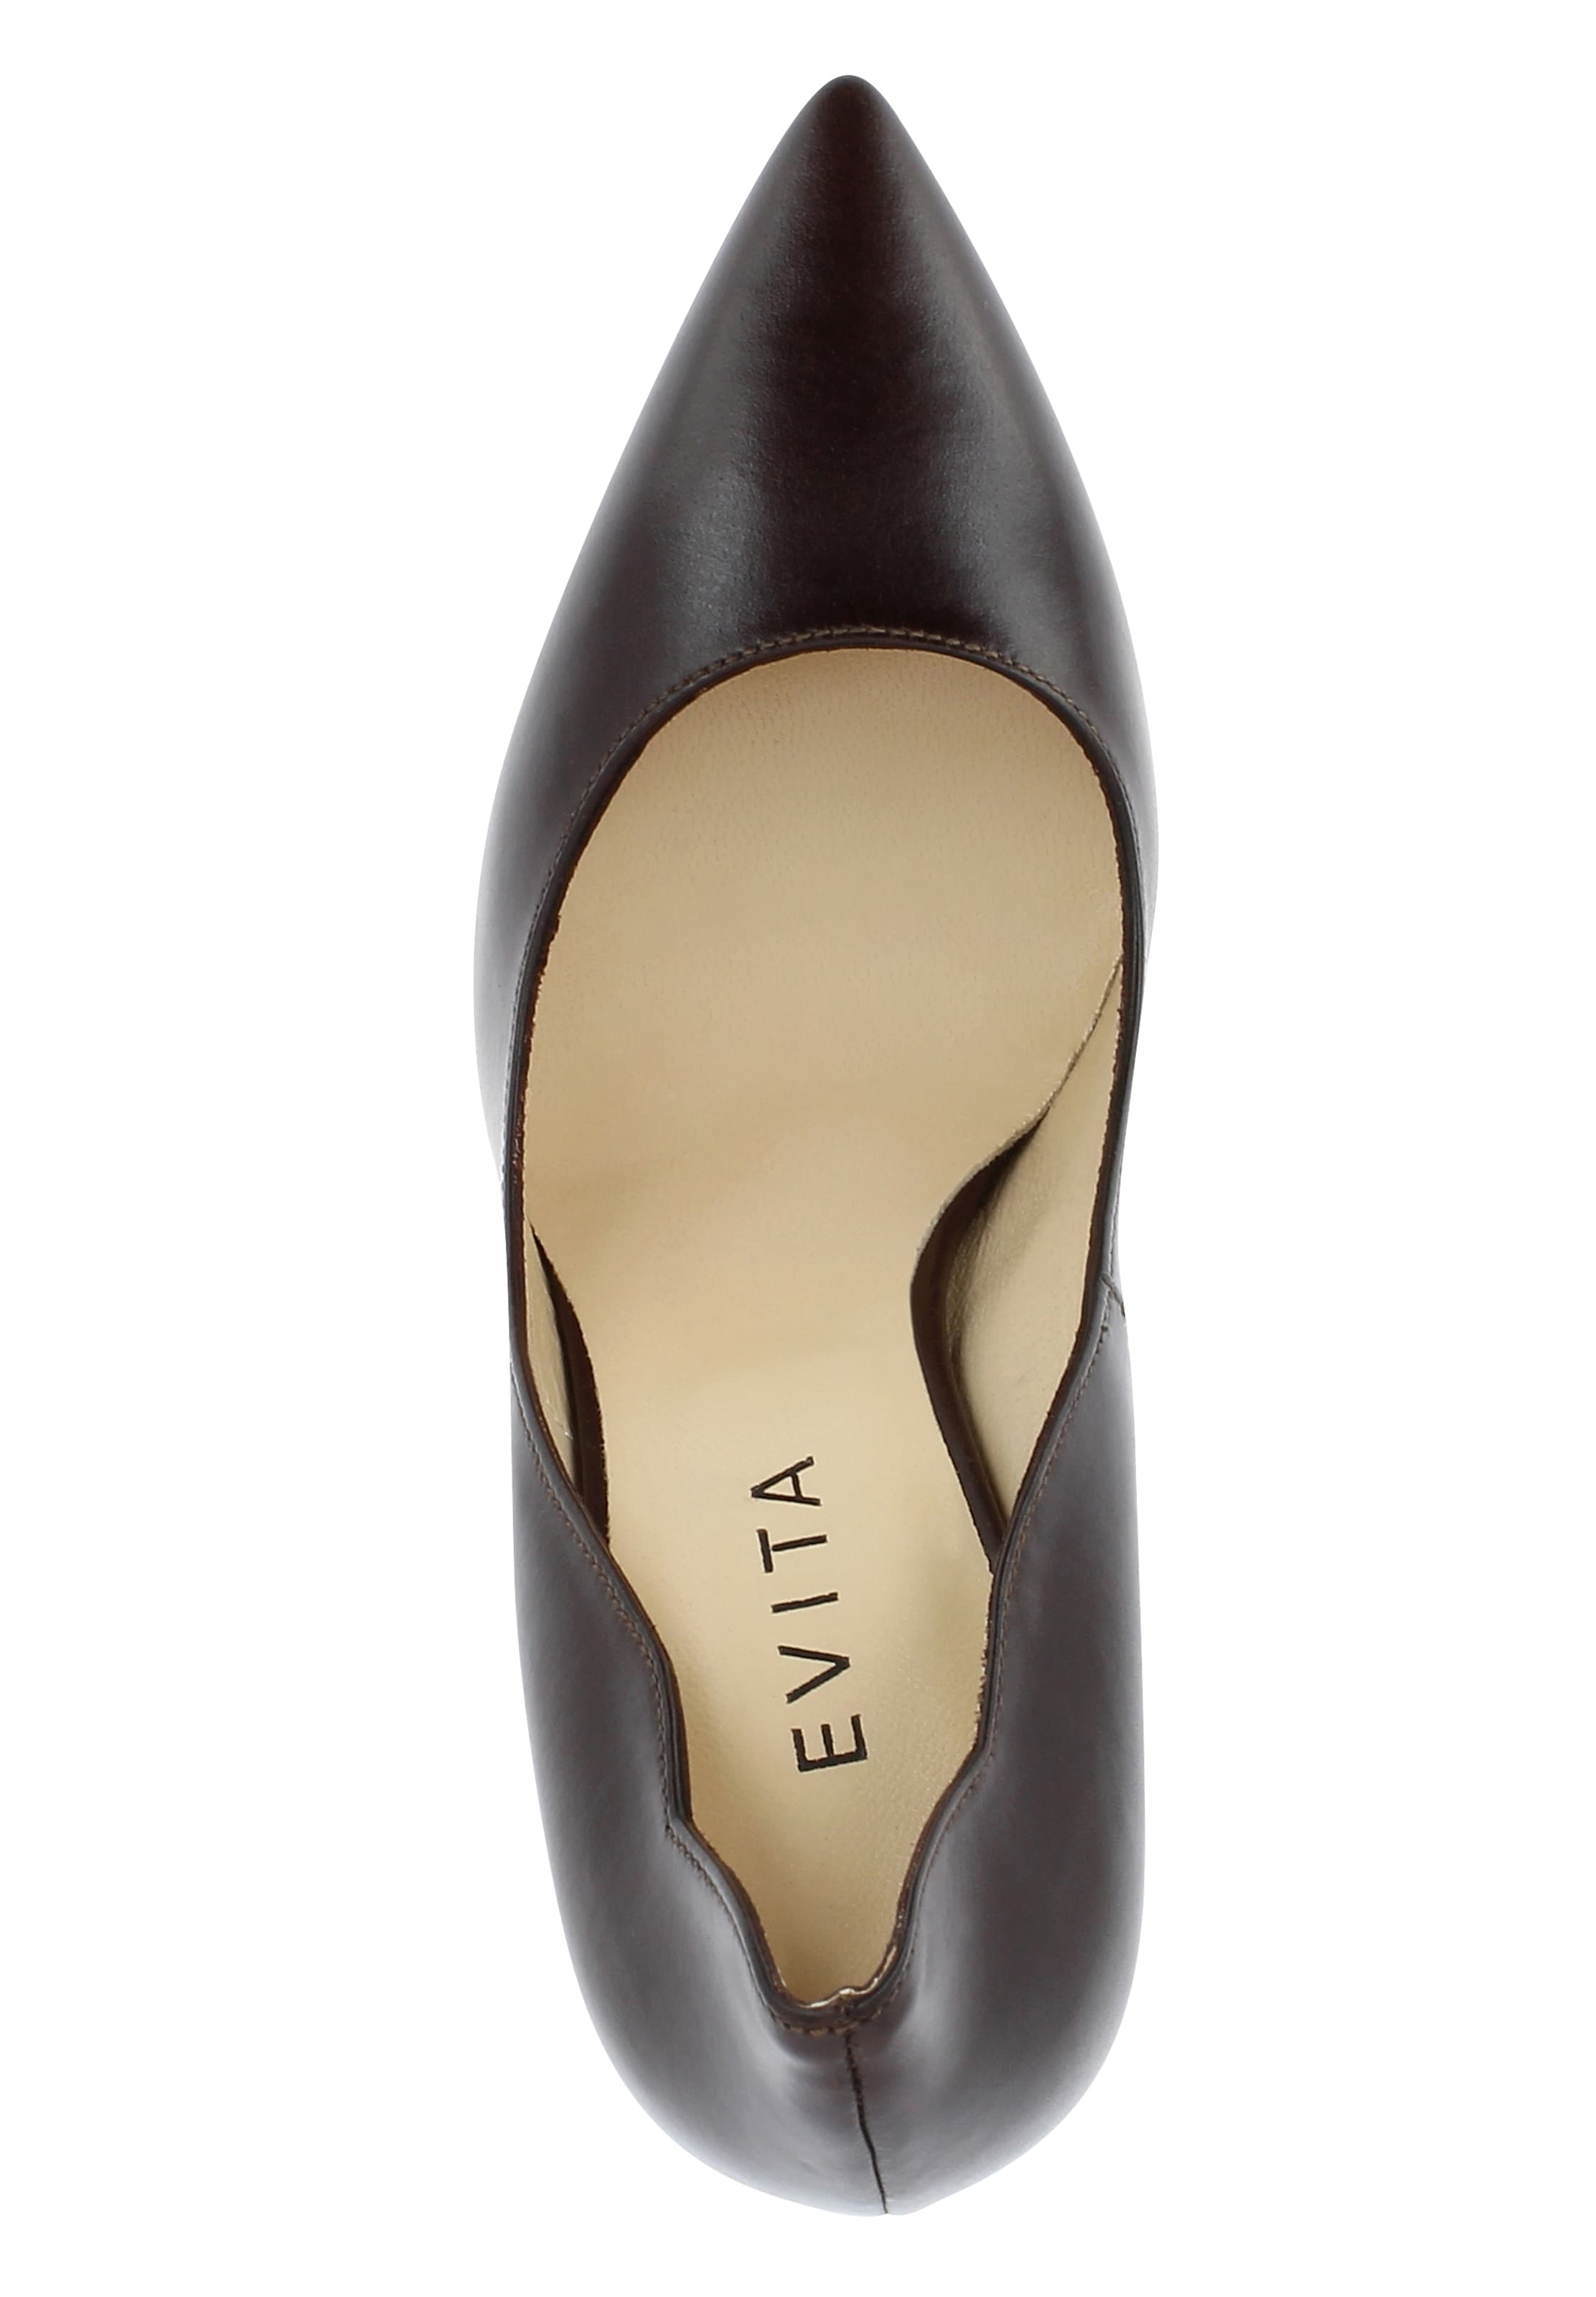 Damen Damen In Evita In Evita Dunkelbraun Evita Pumps Pumps Damen Dunkelbraun OXP8nZN0kw